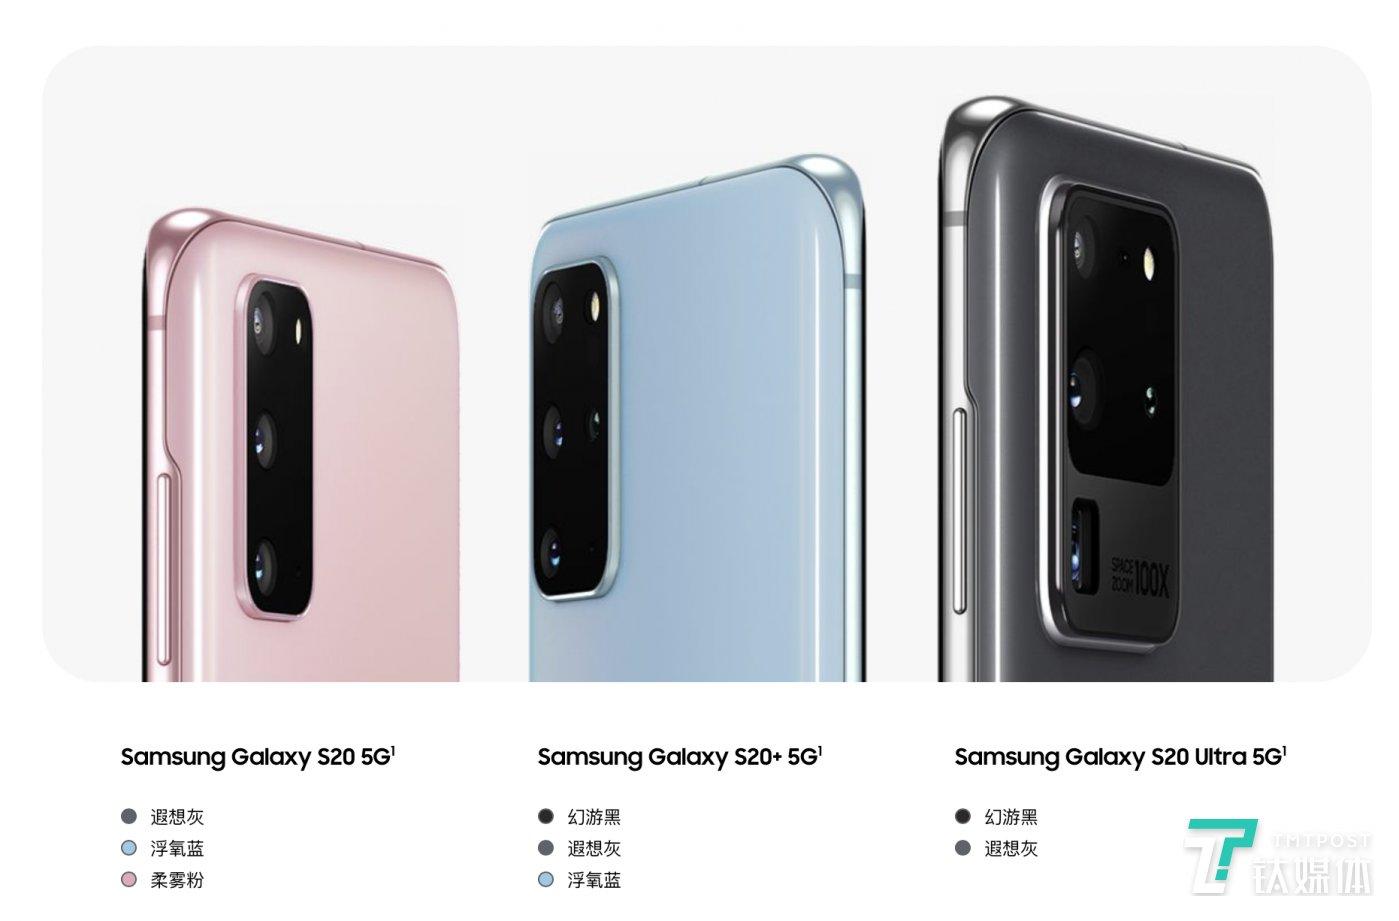 Galaxy S20系列手机配色一览